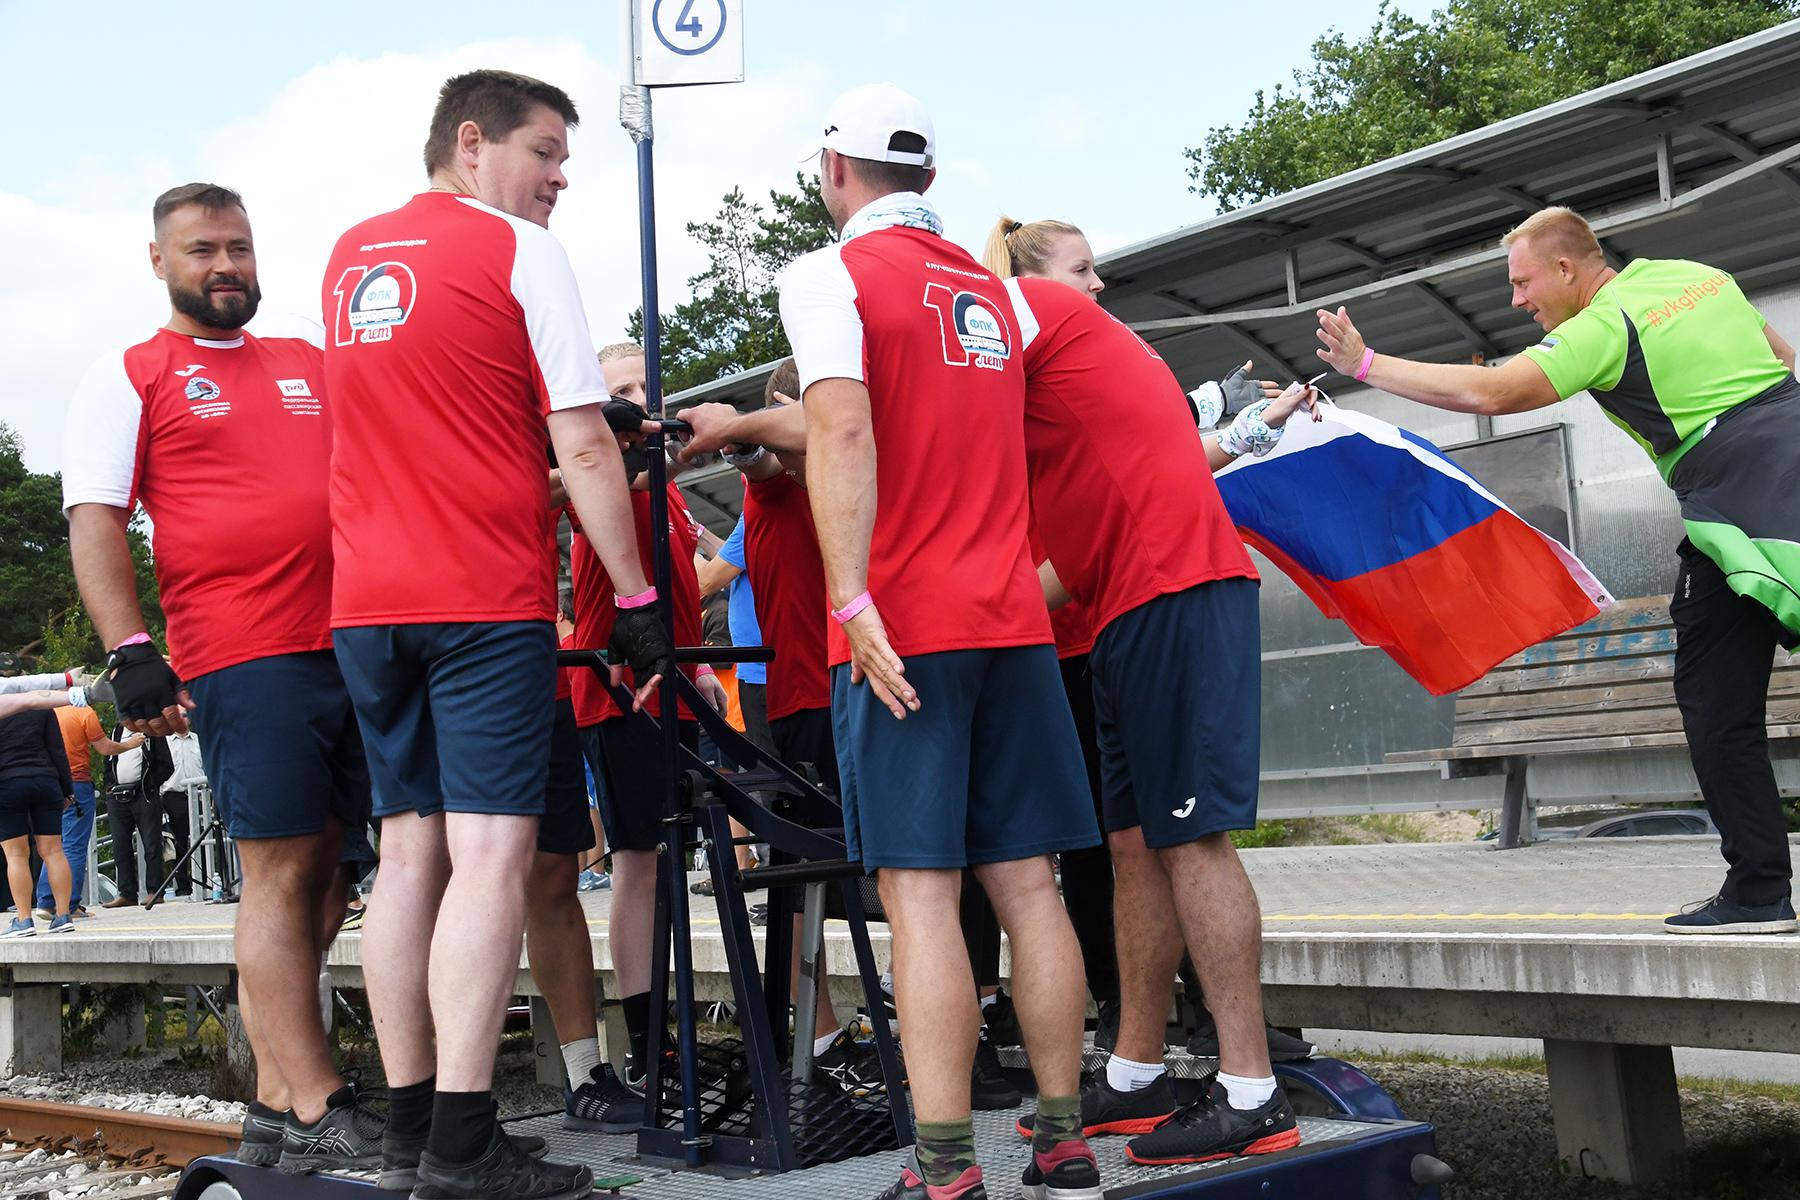 Relsiralli 2019 võit läks Venemaale. Foto Urmas Saard